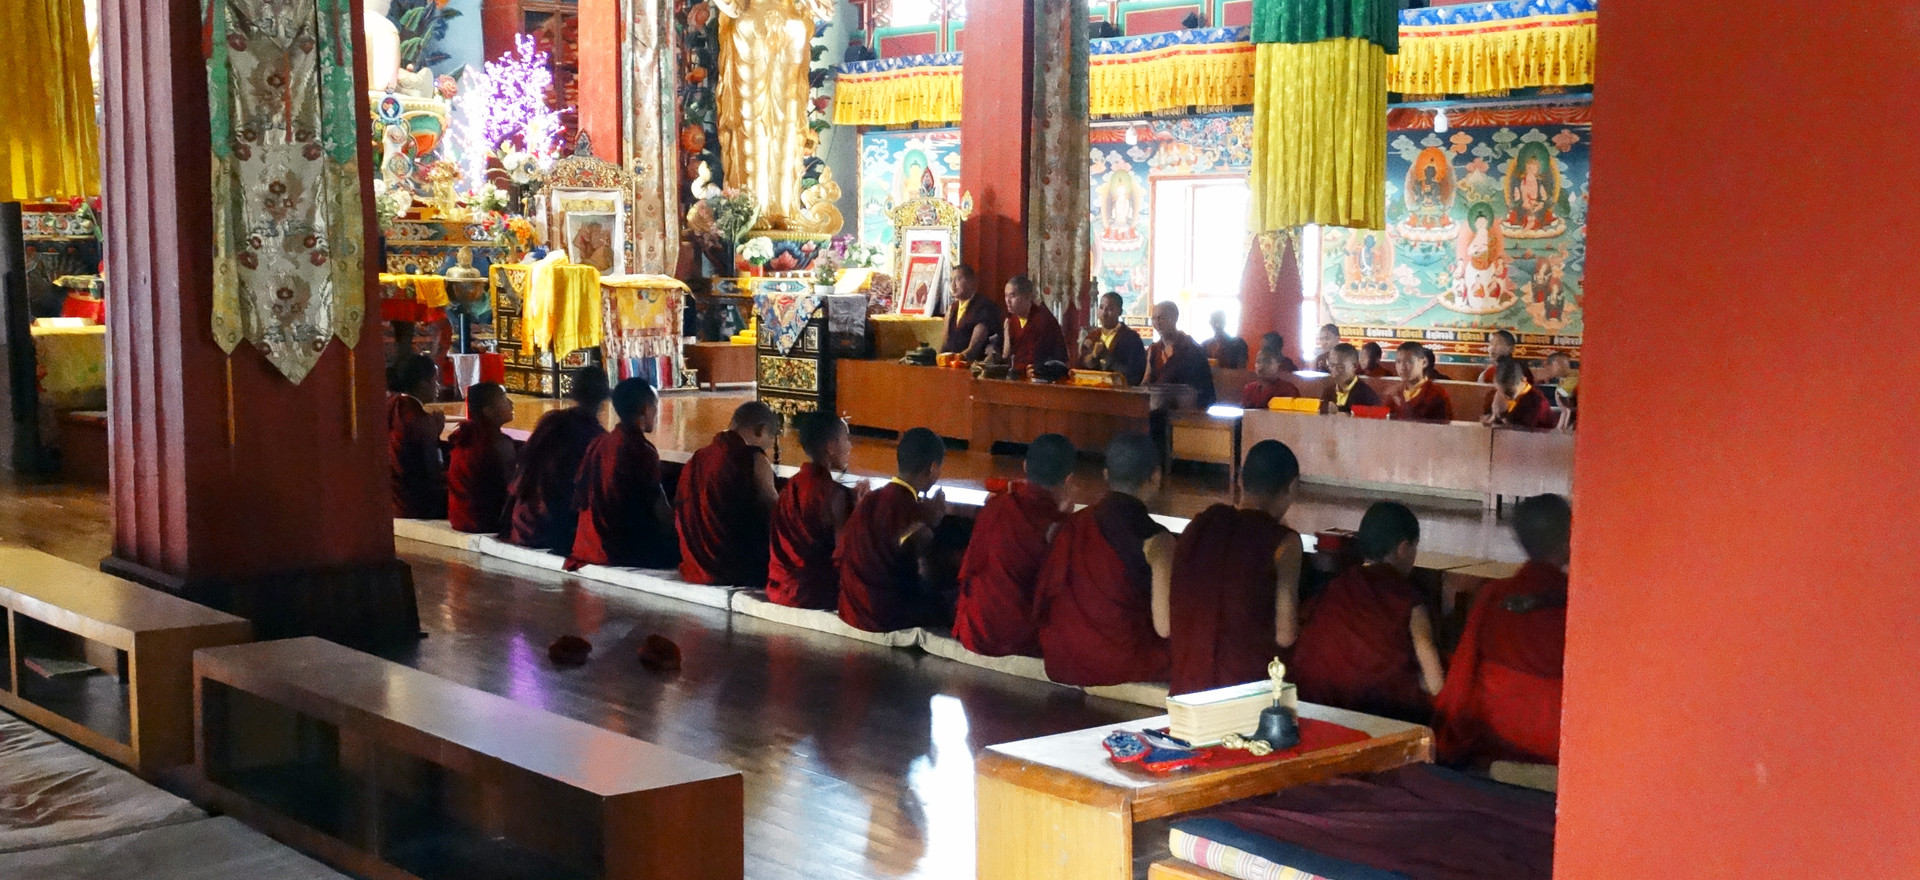 Neydo Monastery - Monikken